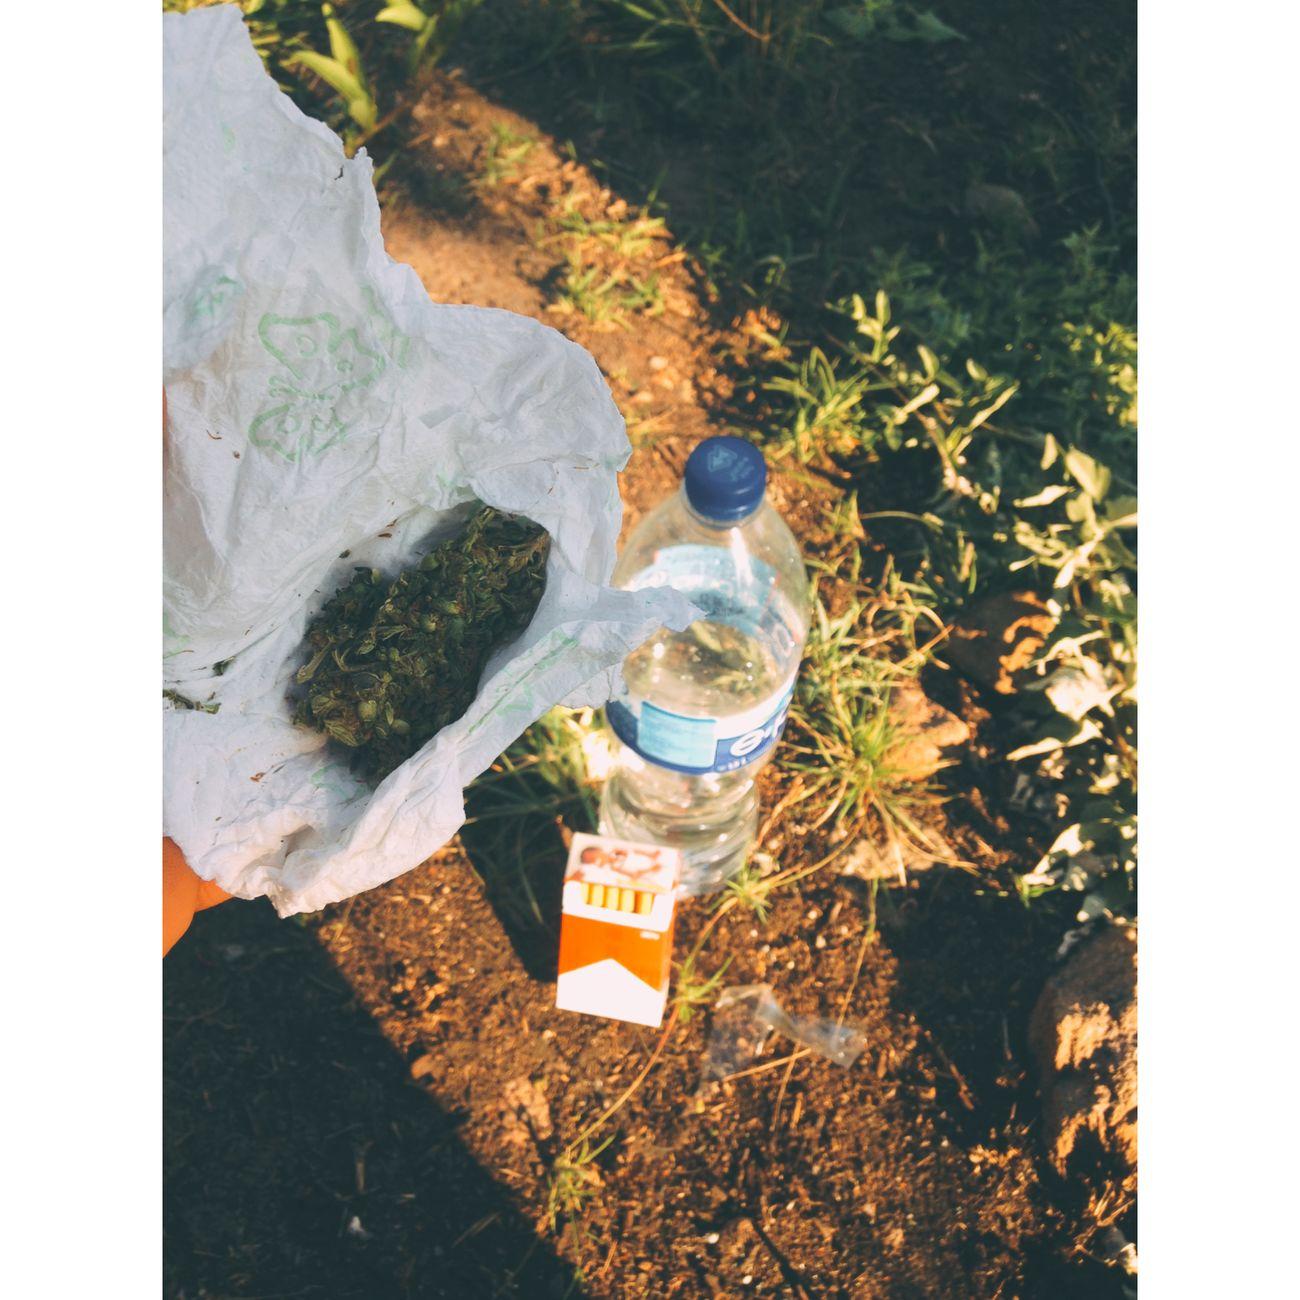 Tarde  Sun ☀ EyesRed Smoking Weed Smoke Weed Weed Life First Eyeem Photo Weed Marihuana Marihuana pa fumar Mariguana